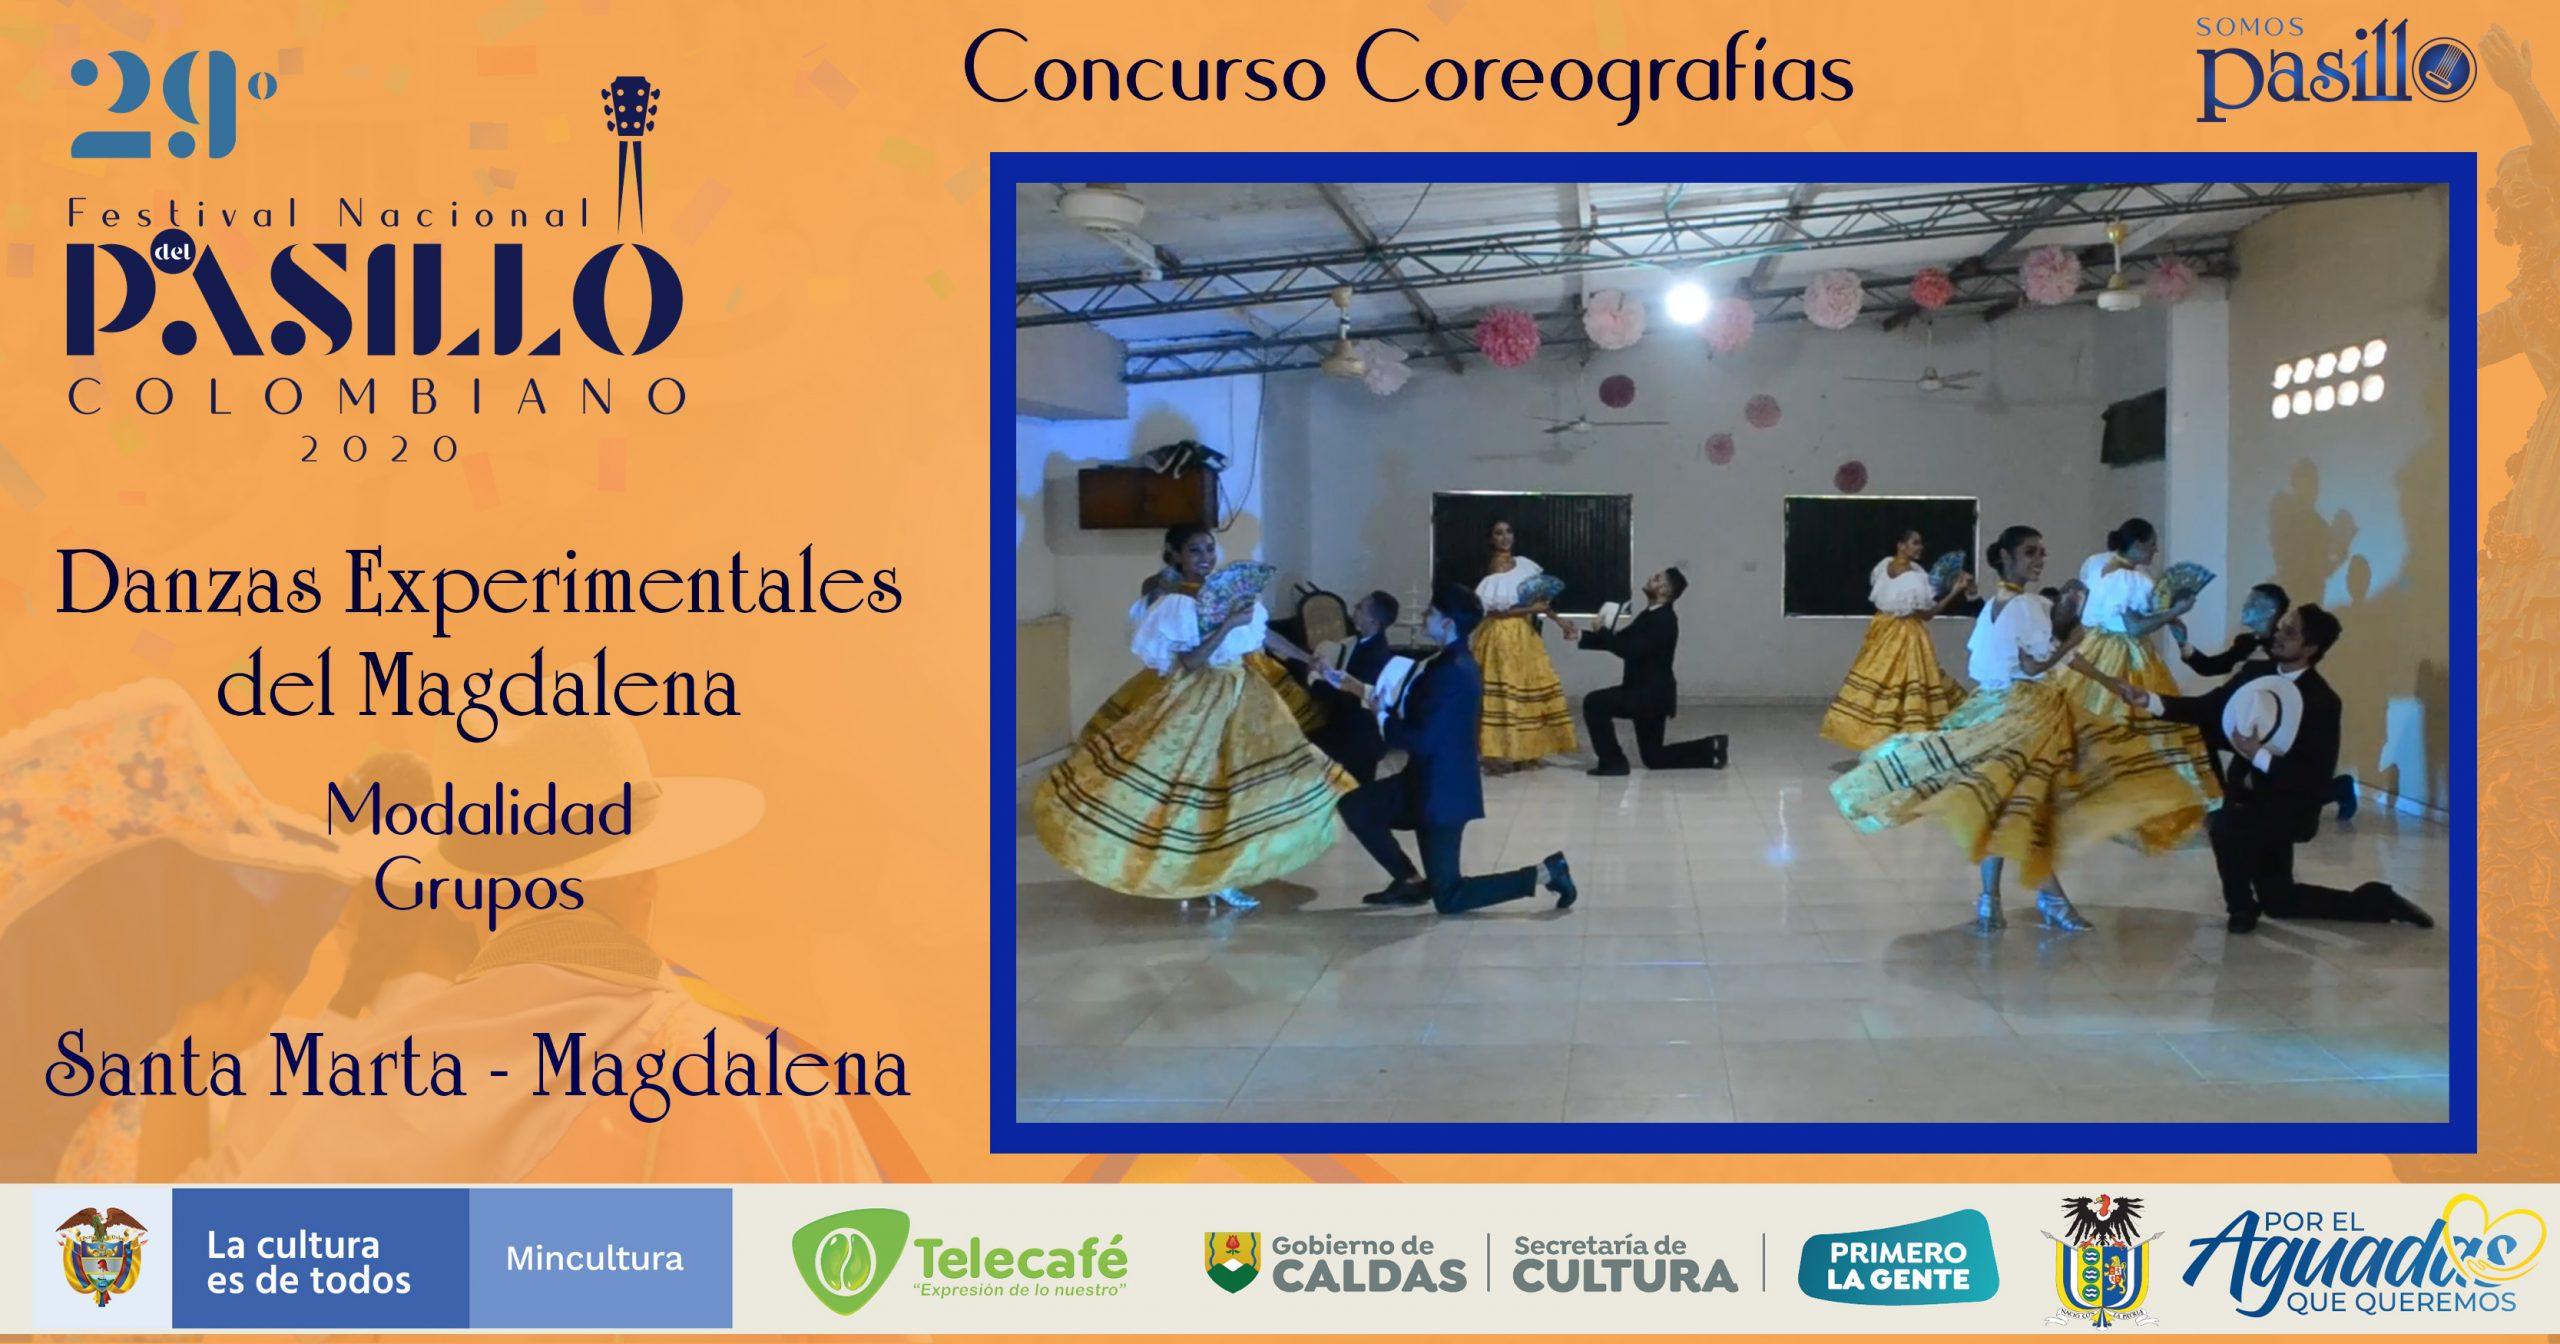 Danzas Experimentales del Magdalena